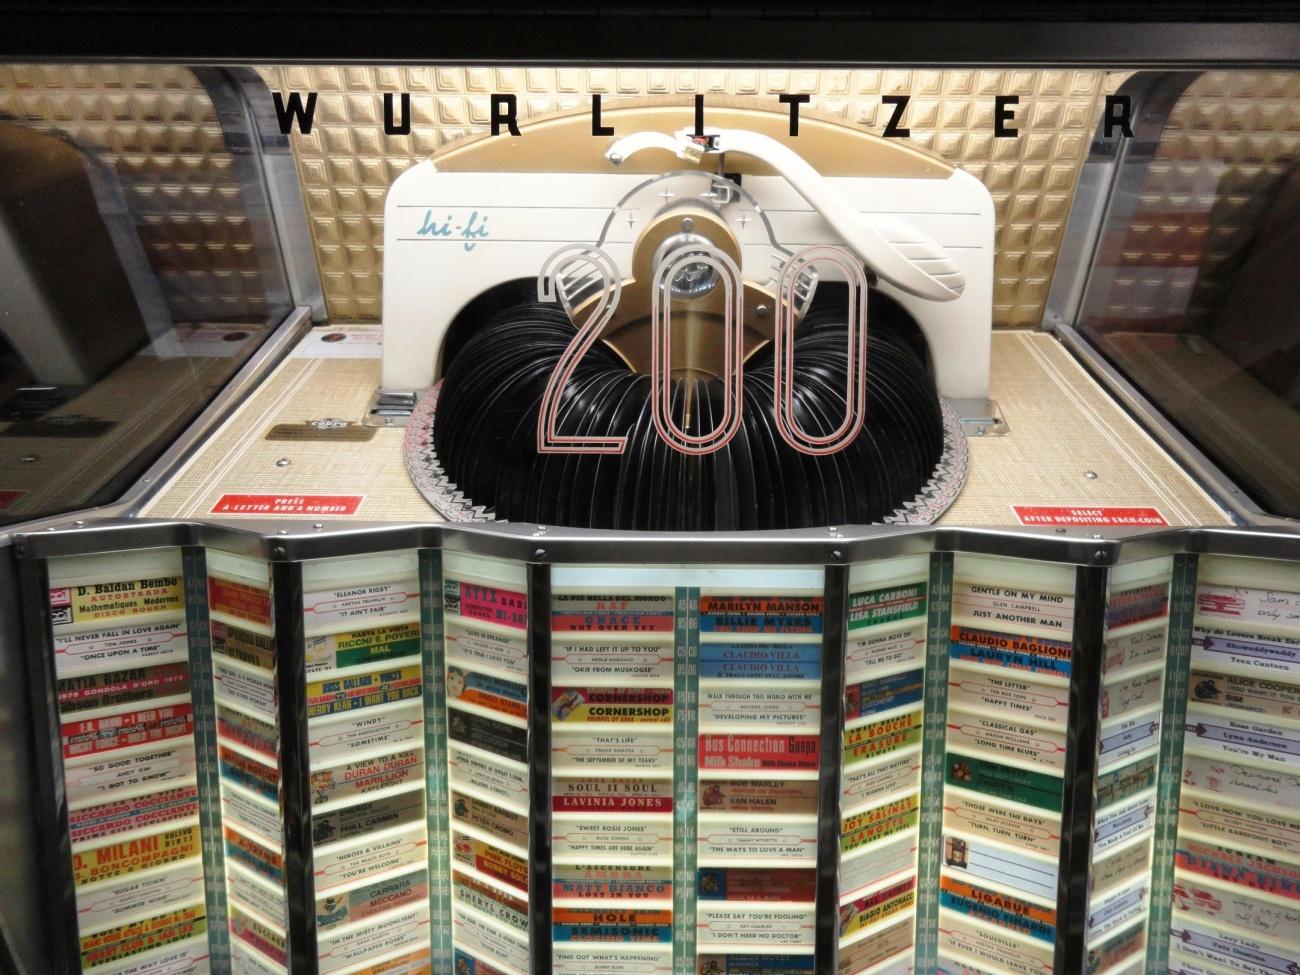 jukebox wurlitzer 2150